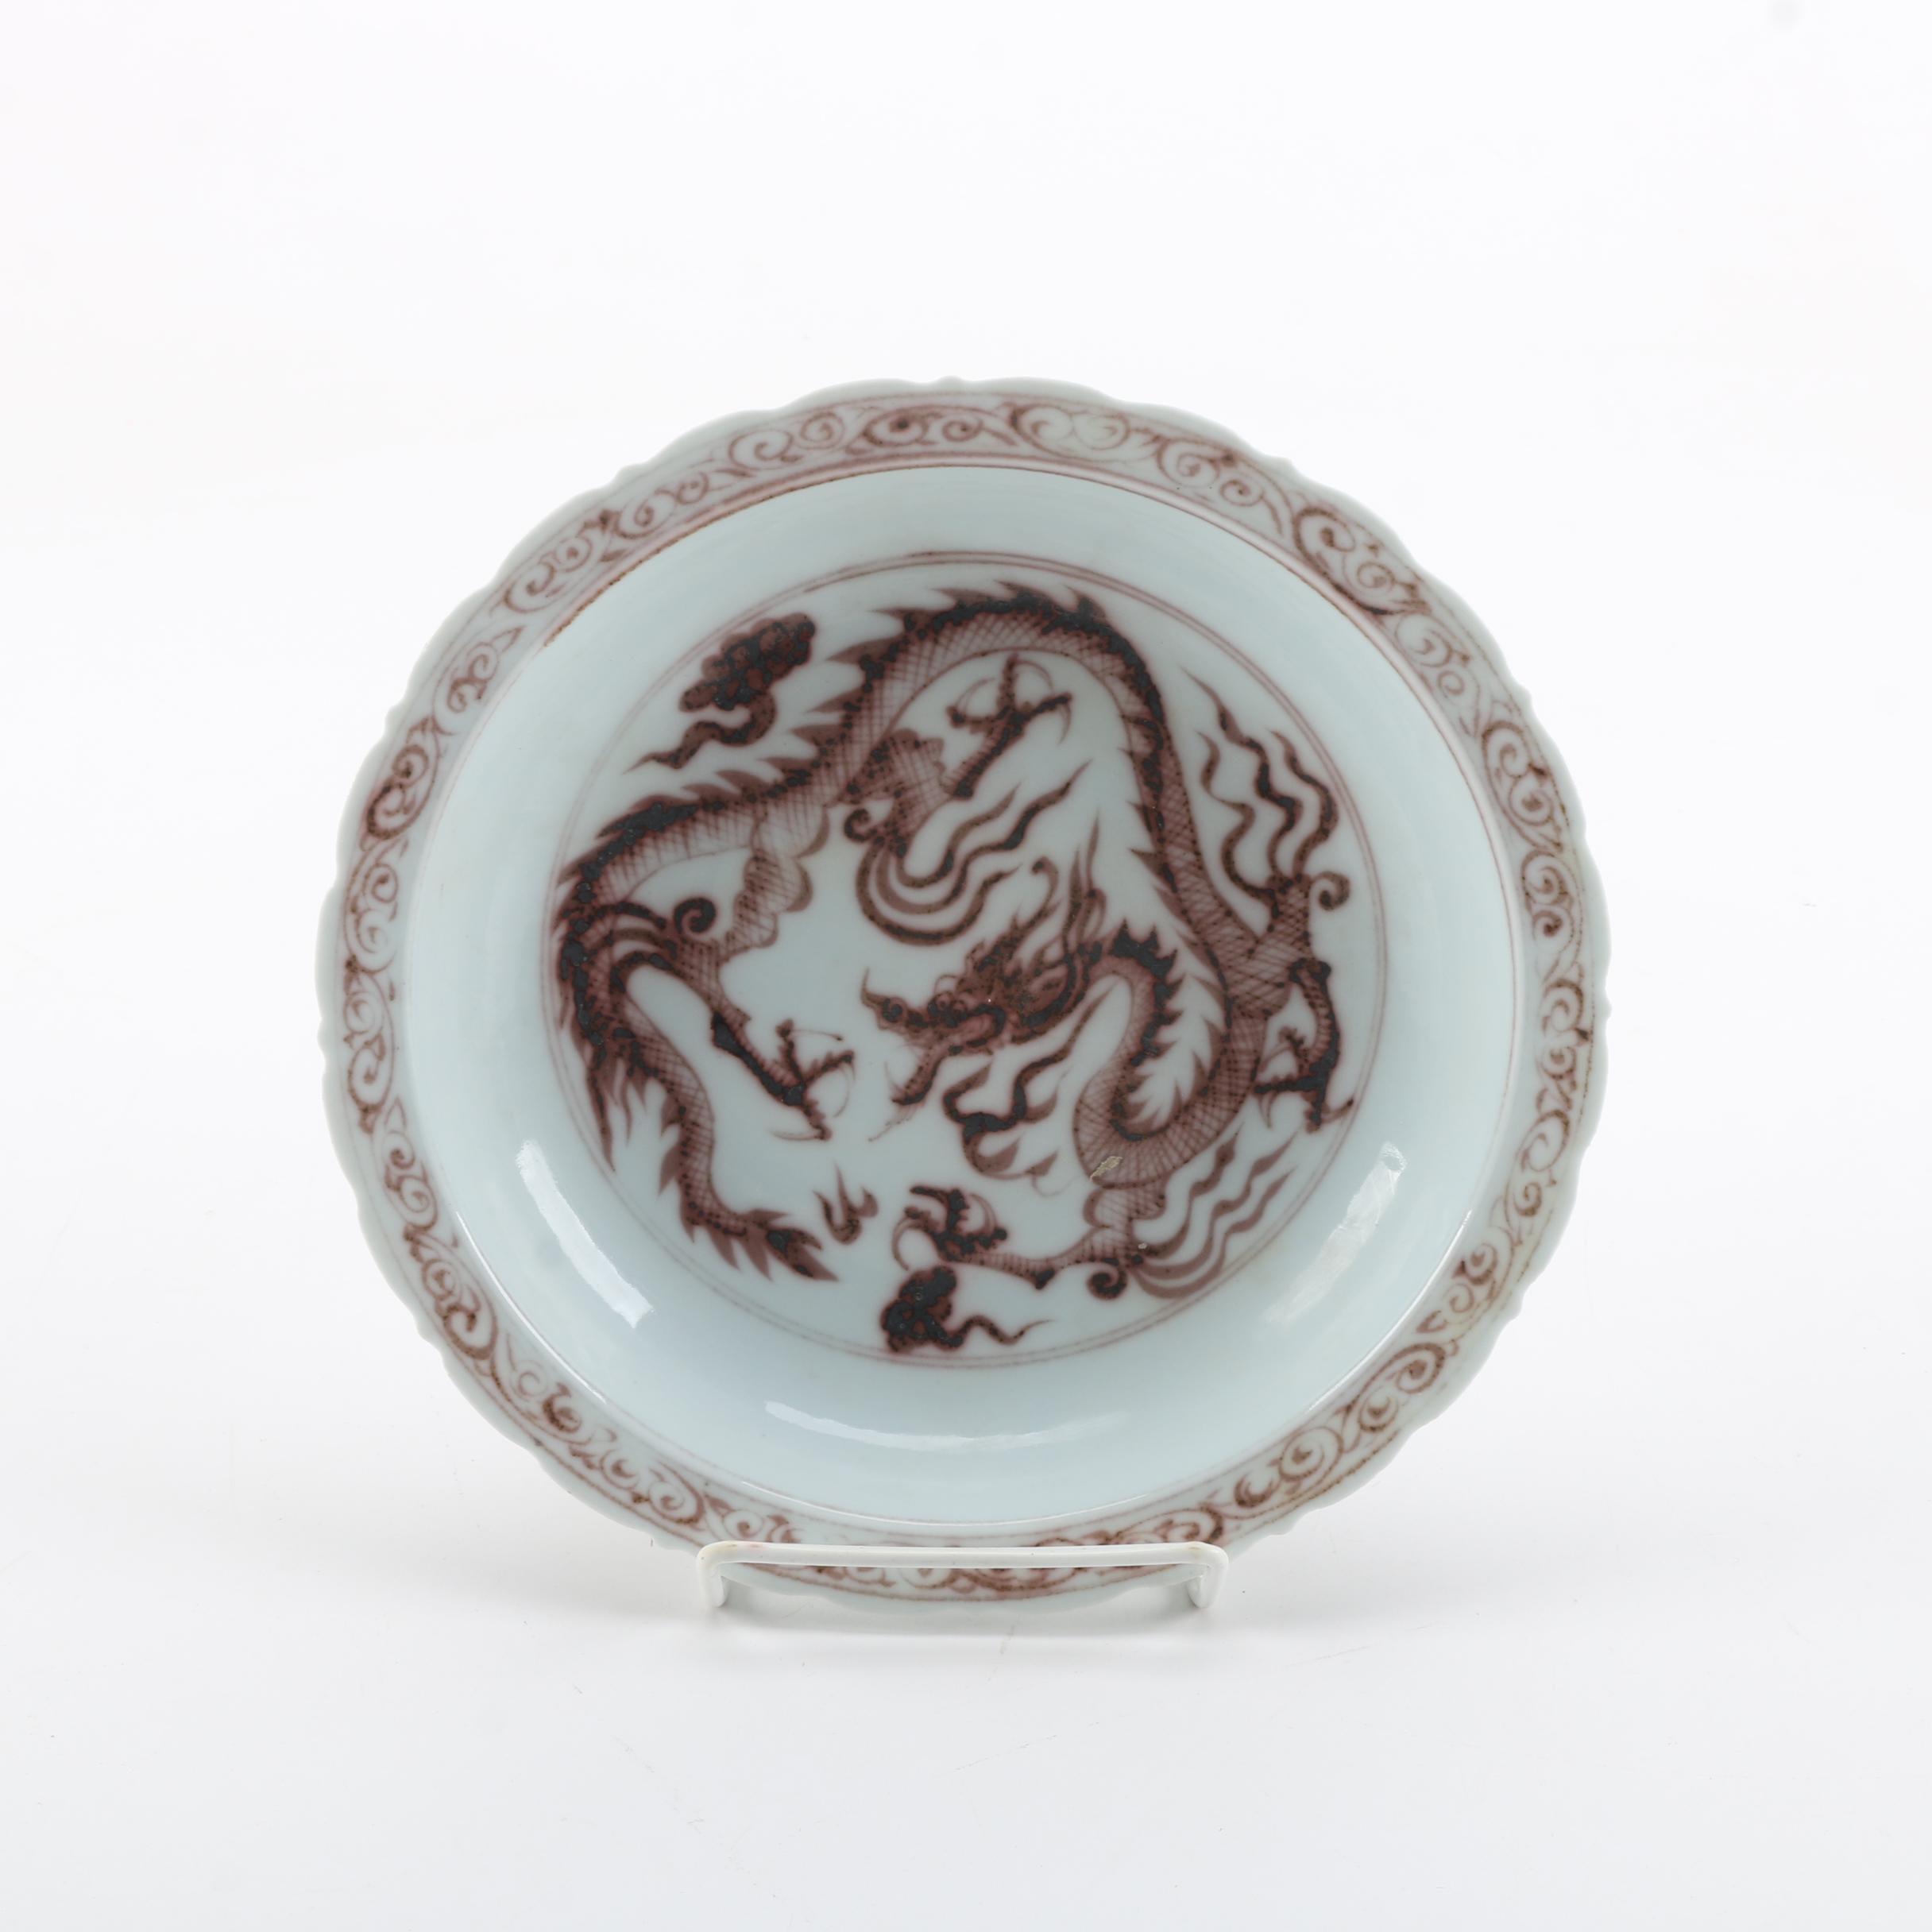 Hand-painted Dragon Motif Chinese Porcelain Bowl